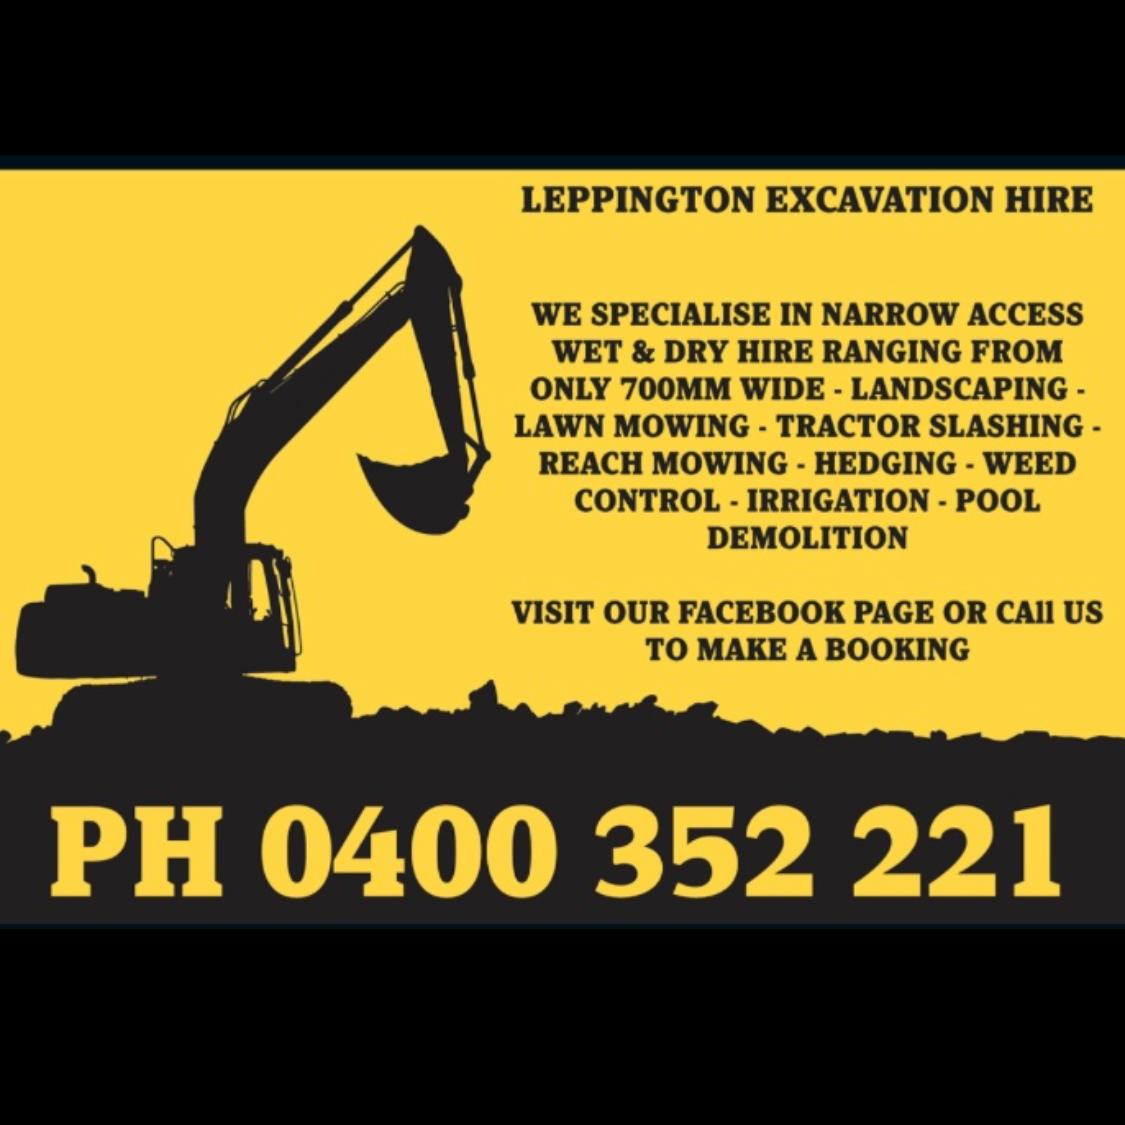 Leppington Excavation Hire Pty Ltd